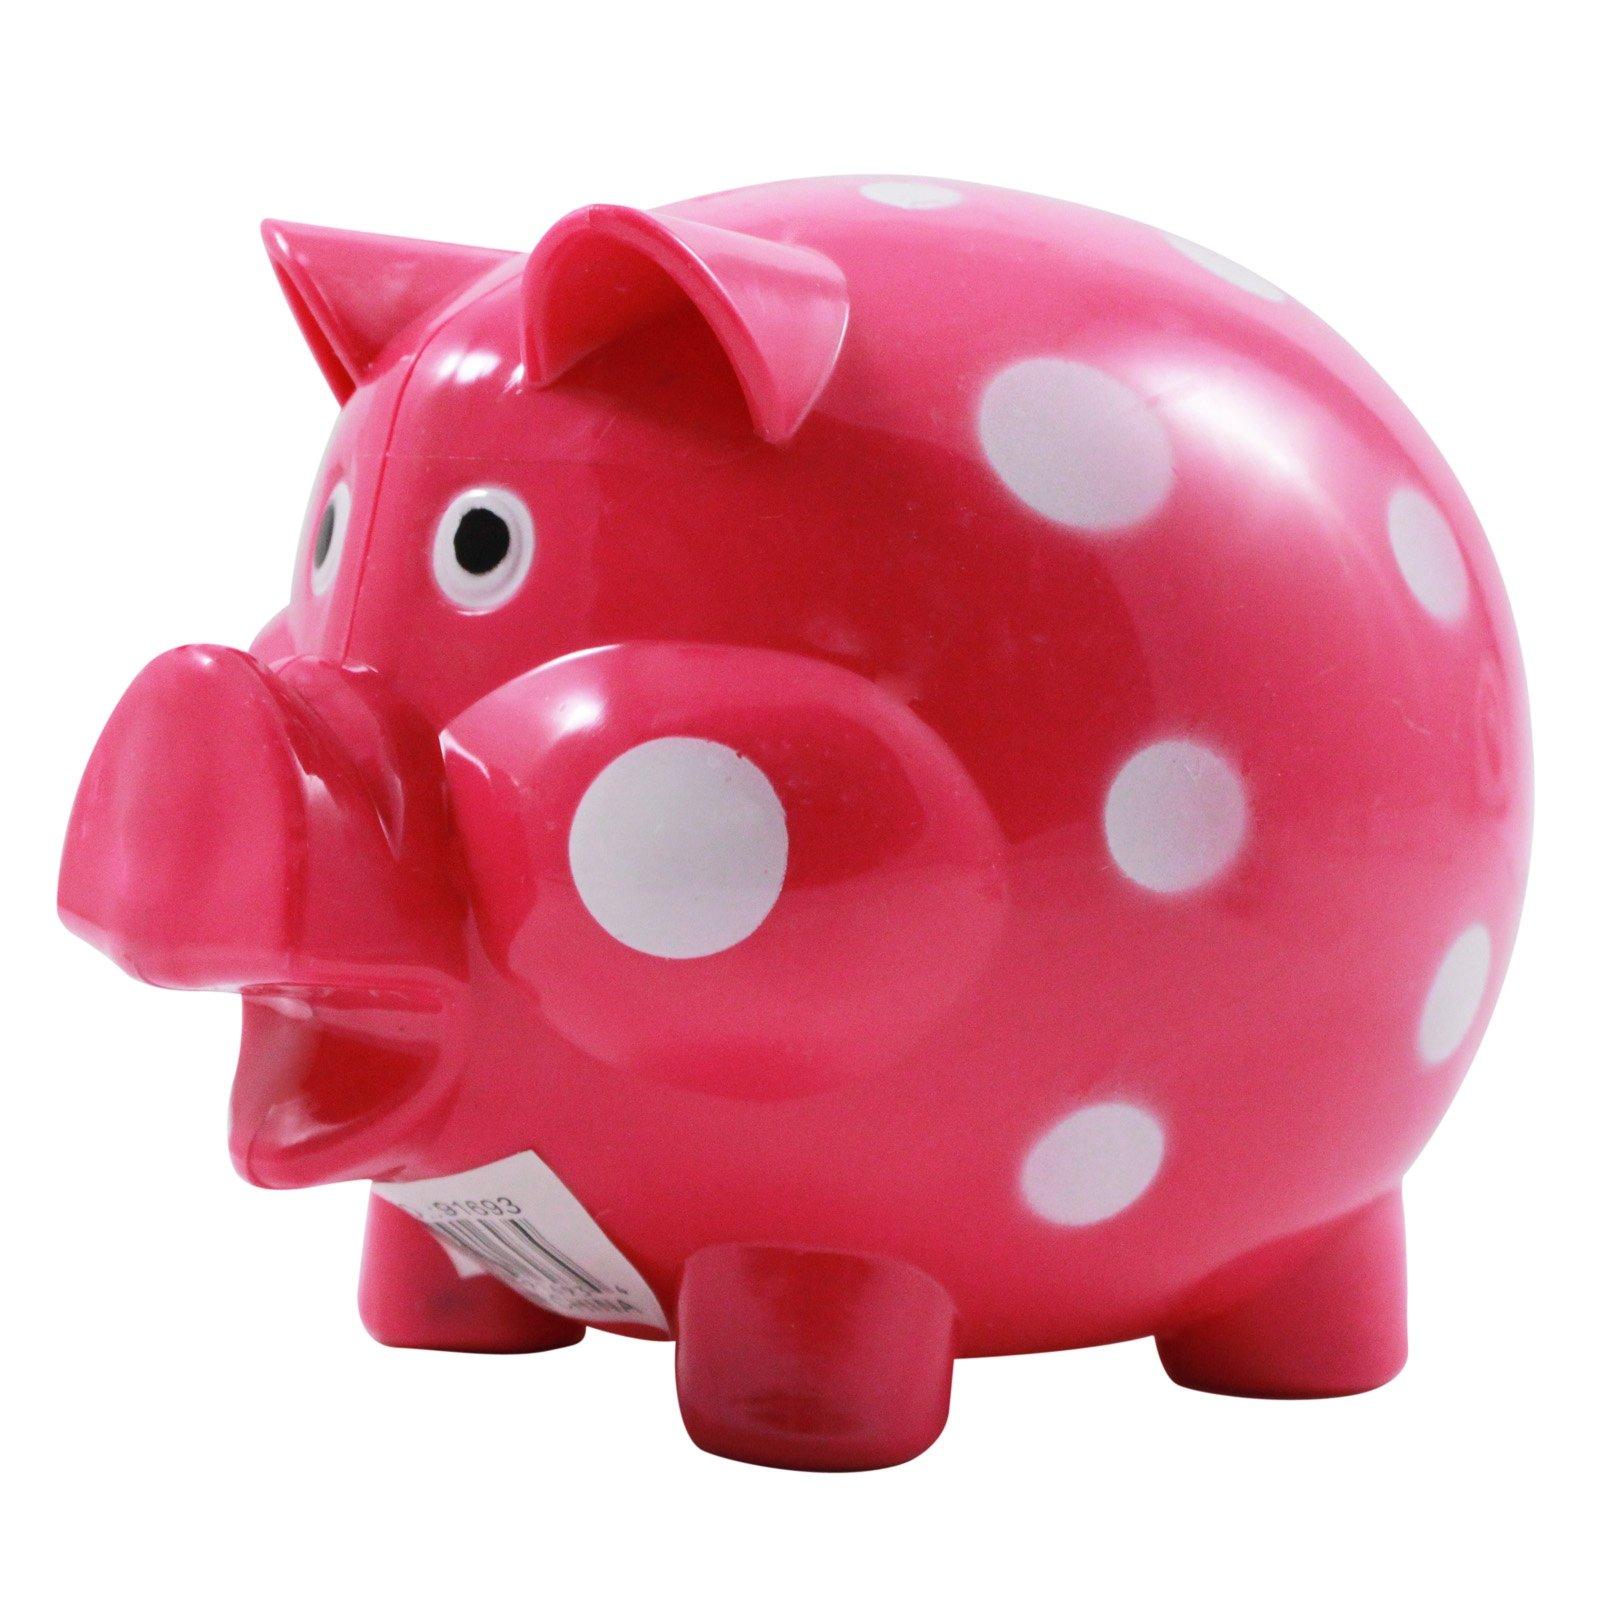 Pink and White Polka Dot Kids Coin Saving Piggy Bank